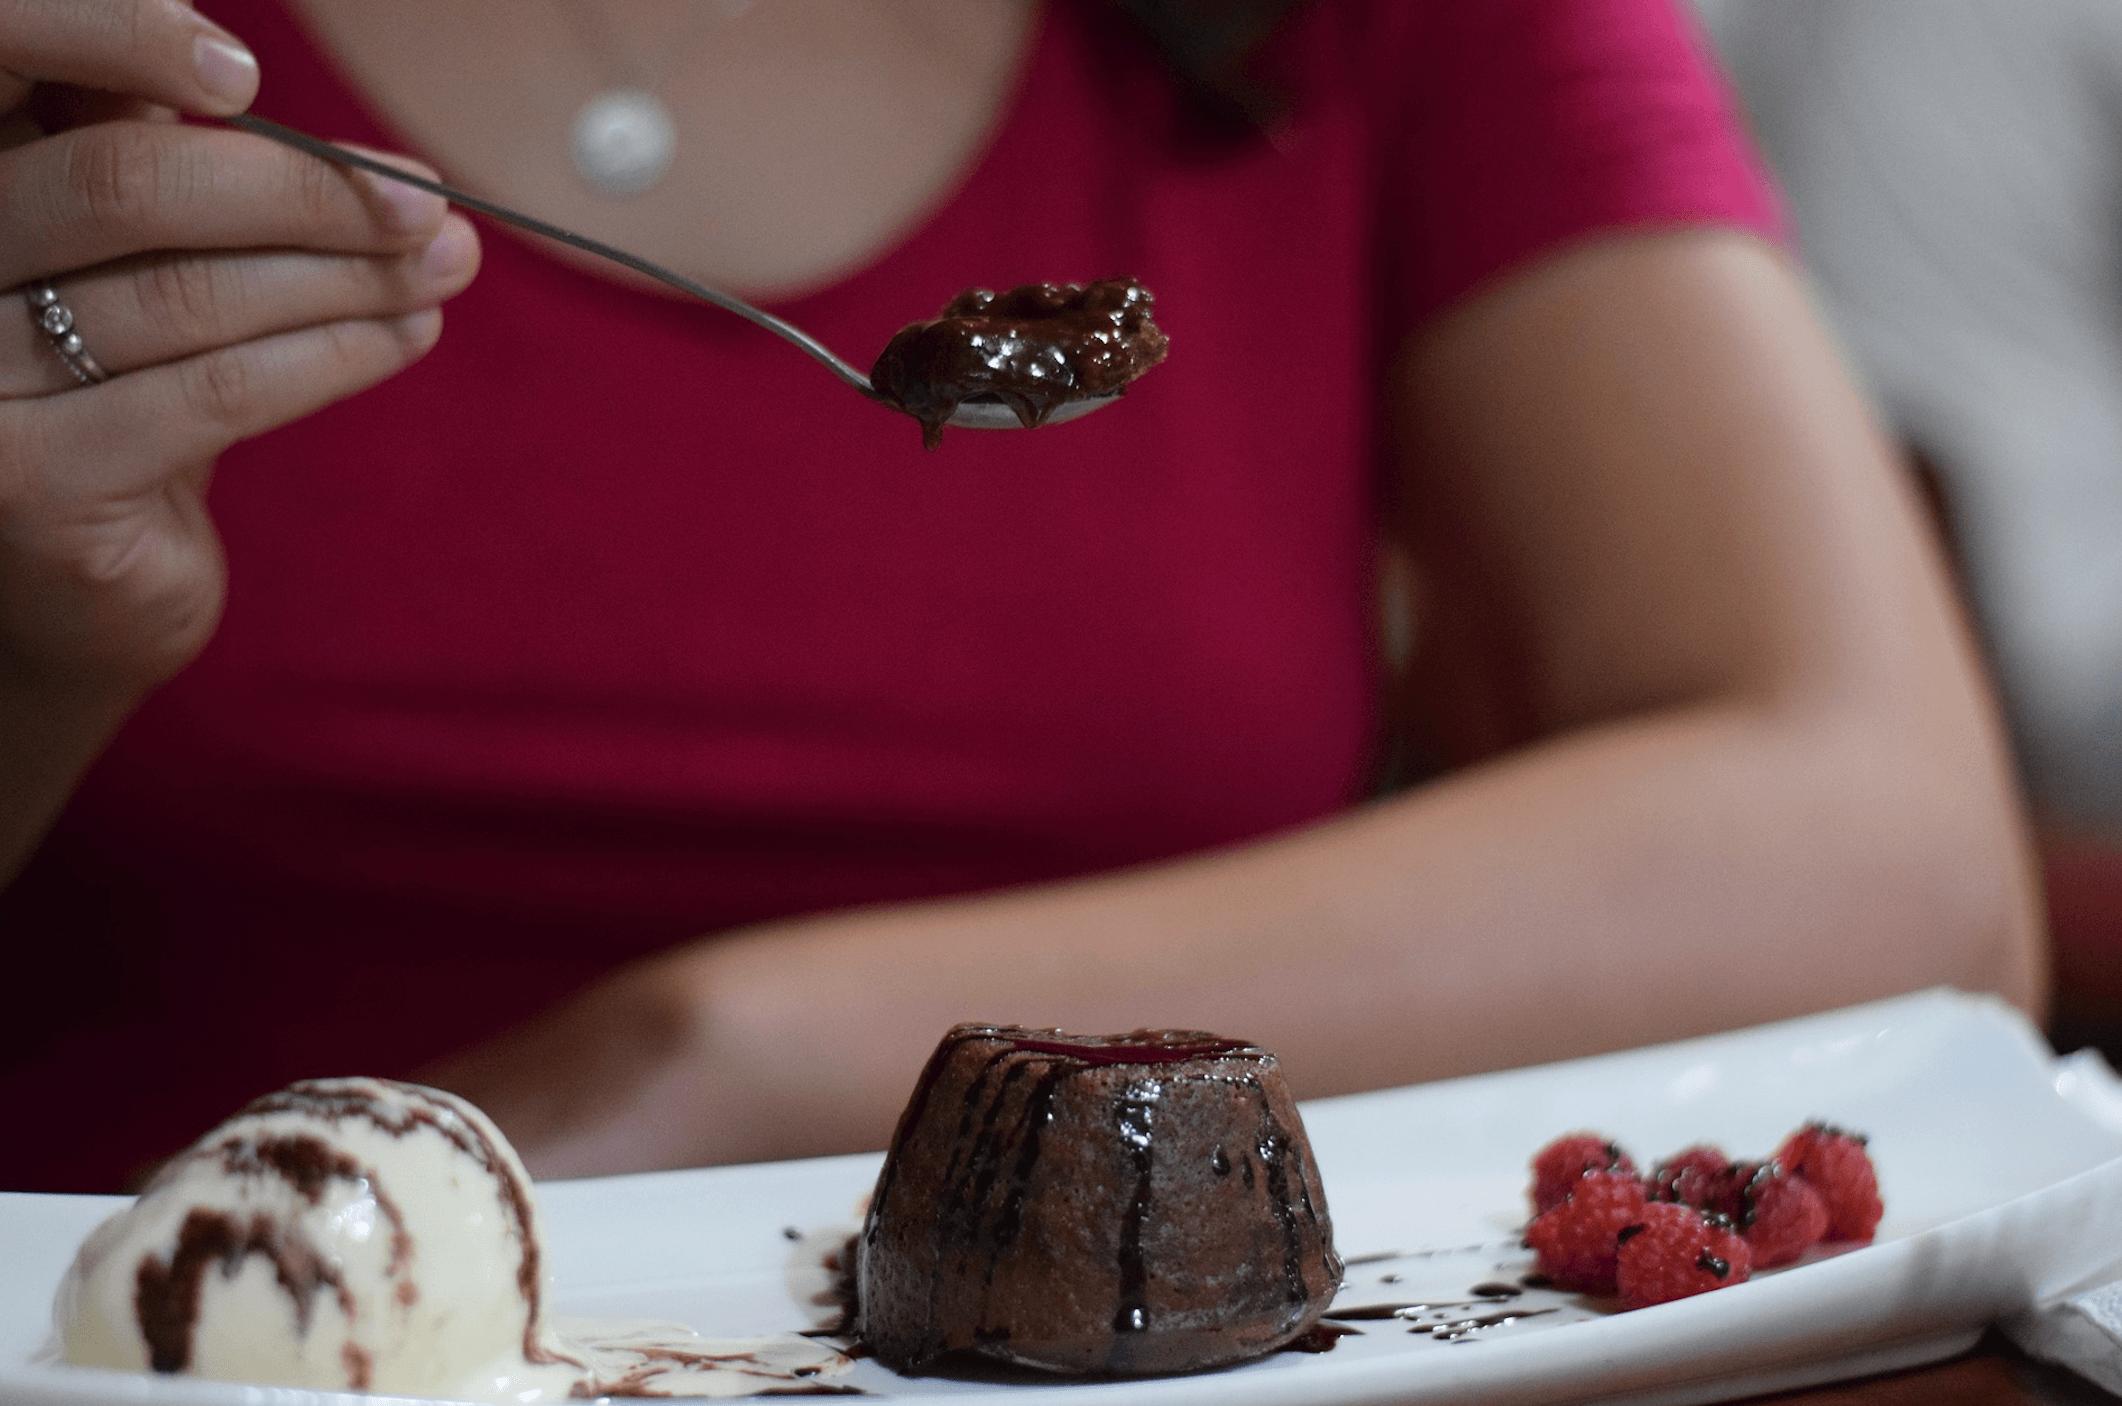 waarom calorieën tellen